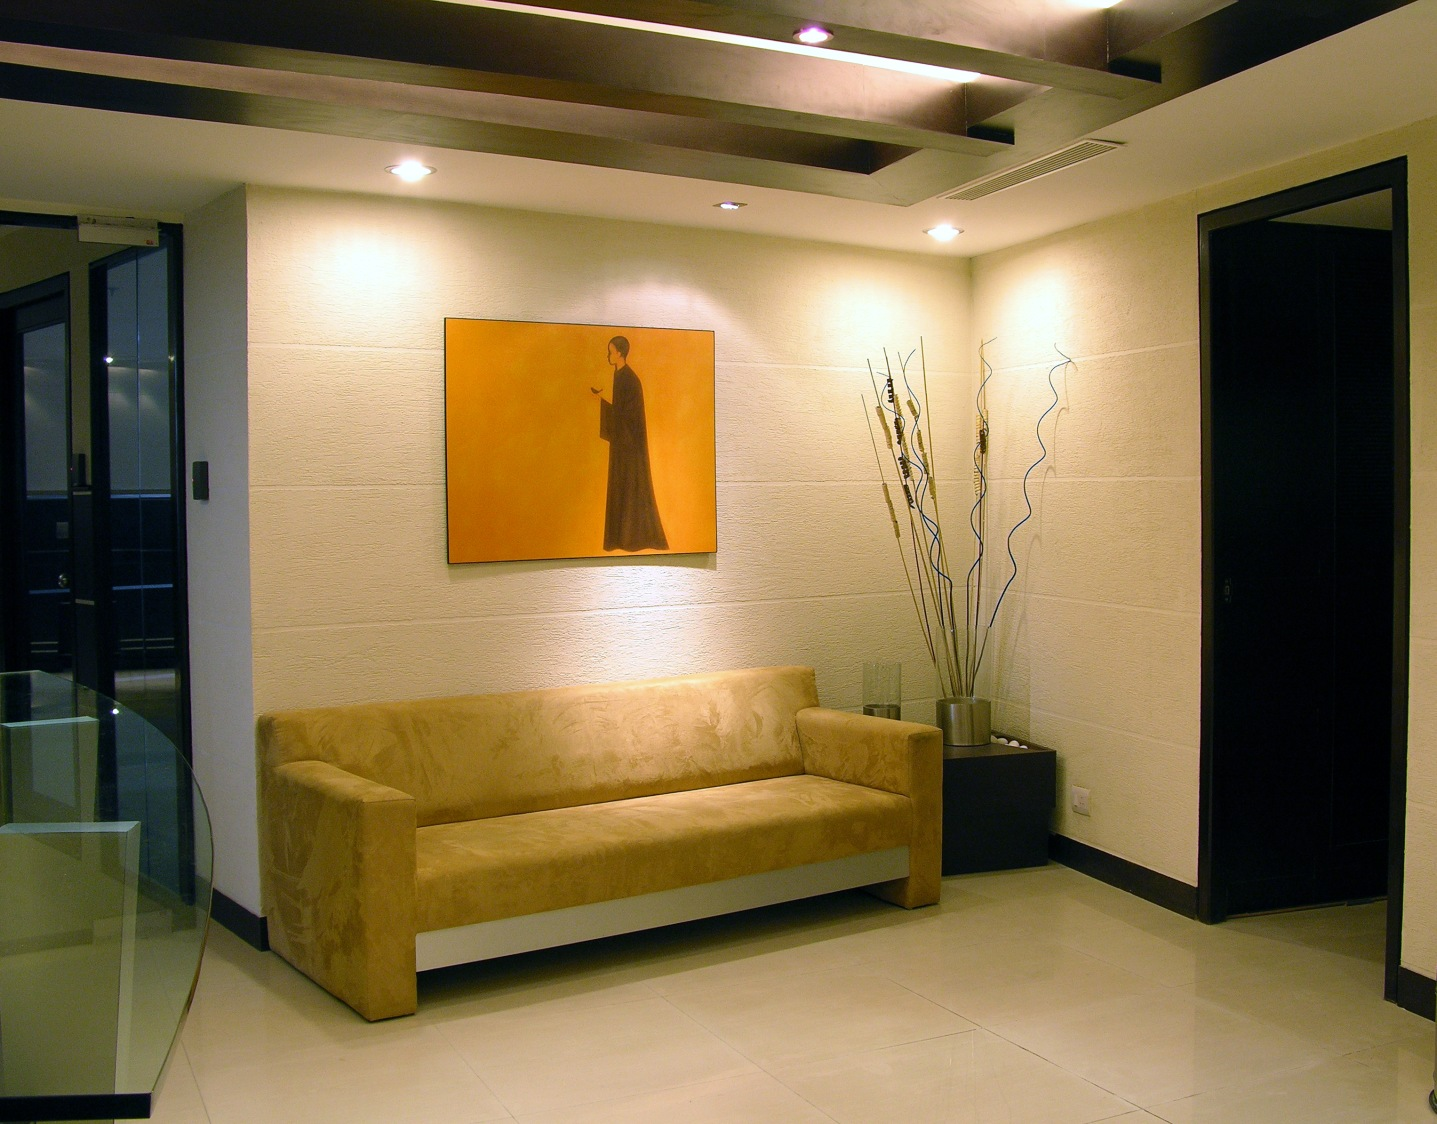 Modern Waiting Area by Vijay Kapur Designs Contemporary | Interior Design Photos & Ideas